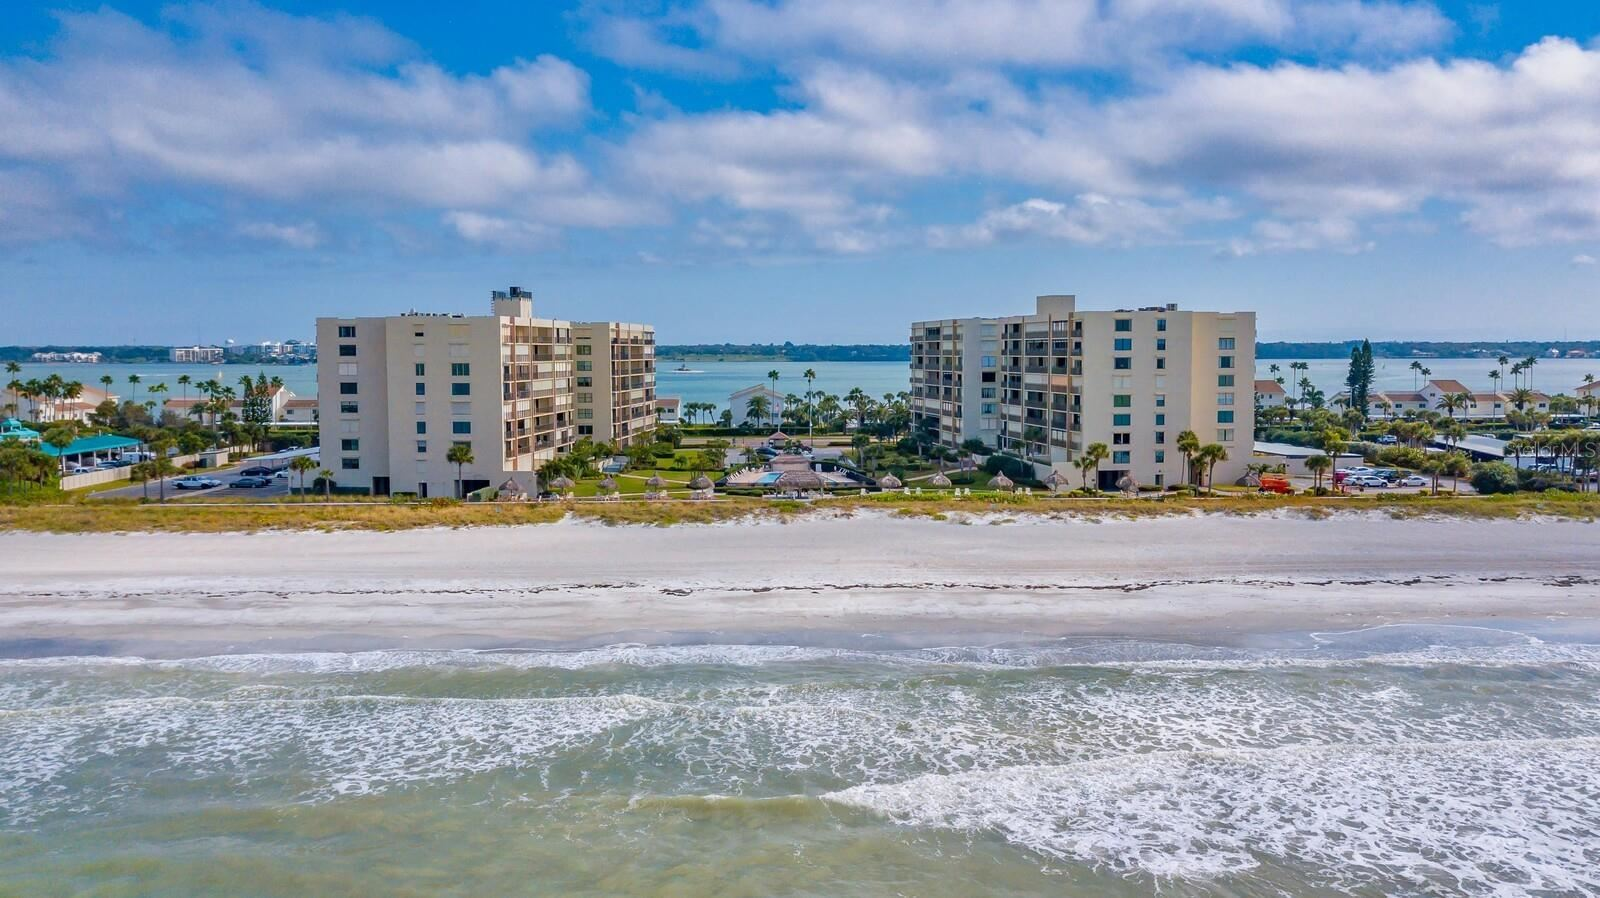 1400 GULF BOULEVARD #508, Clearwater, FL 33767 - #: U8129852